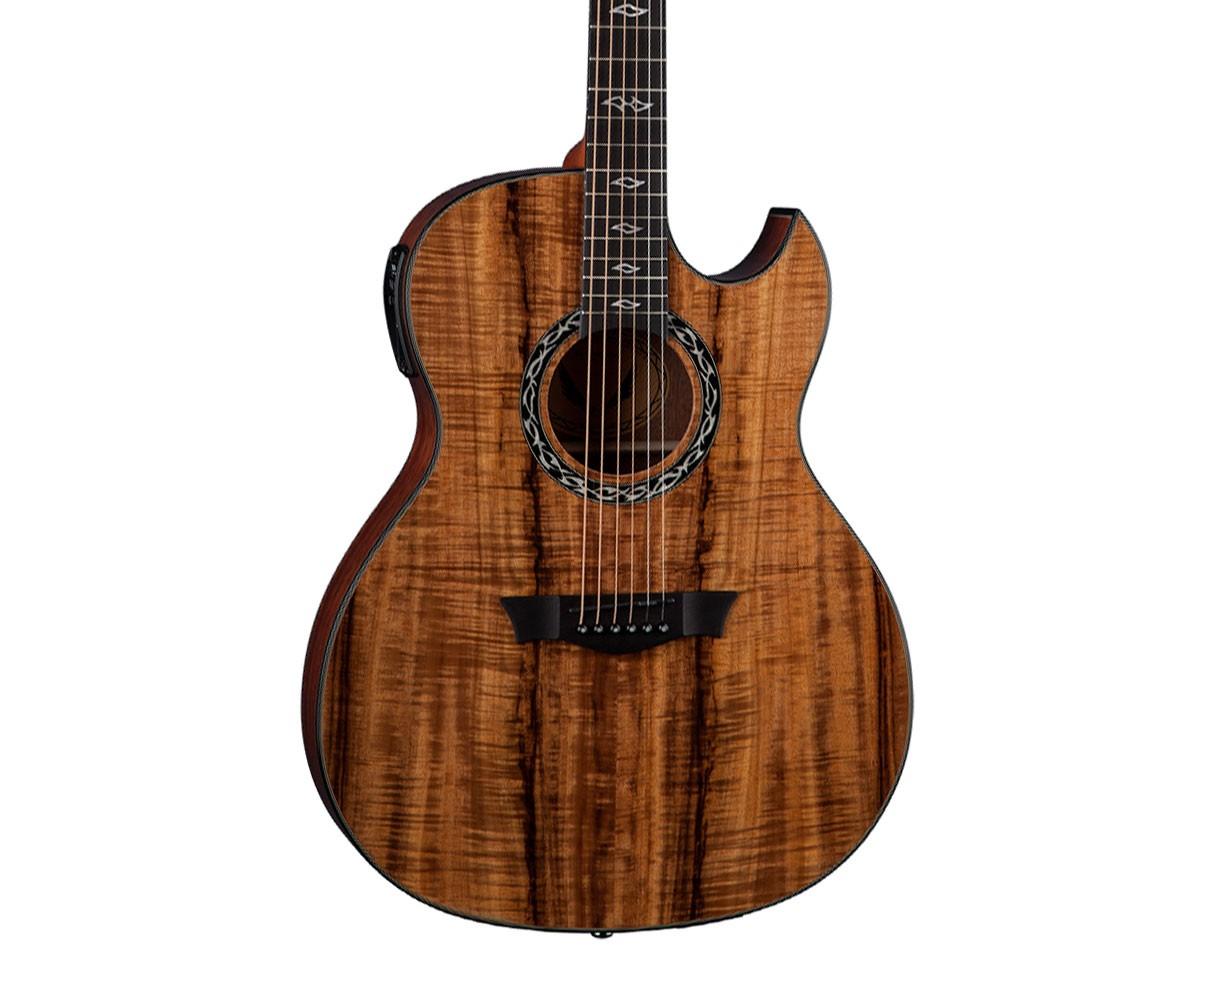 dean guitars exhibition acoustic electric guitar koa ebay. Black Bedroom Furniture Sets. Home Design Ideas